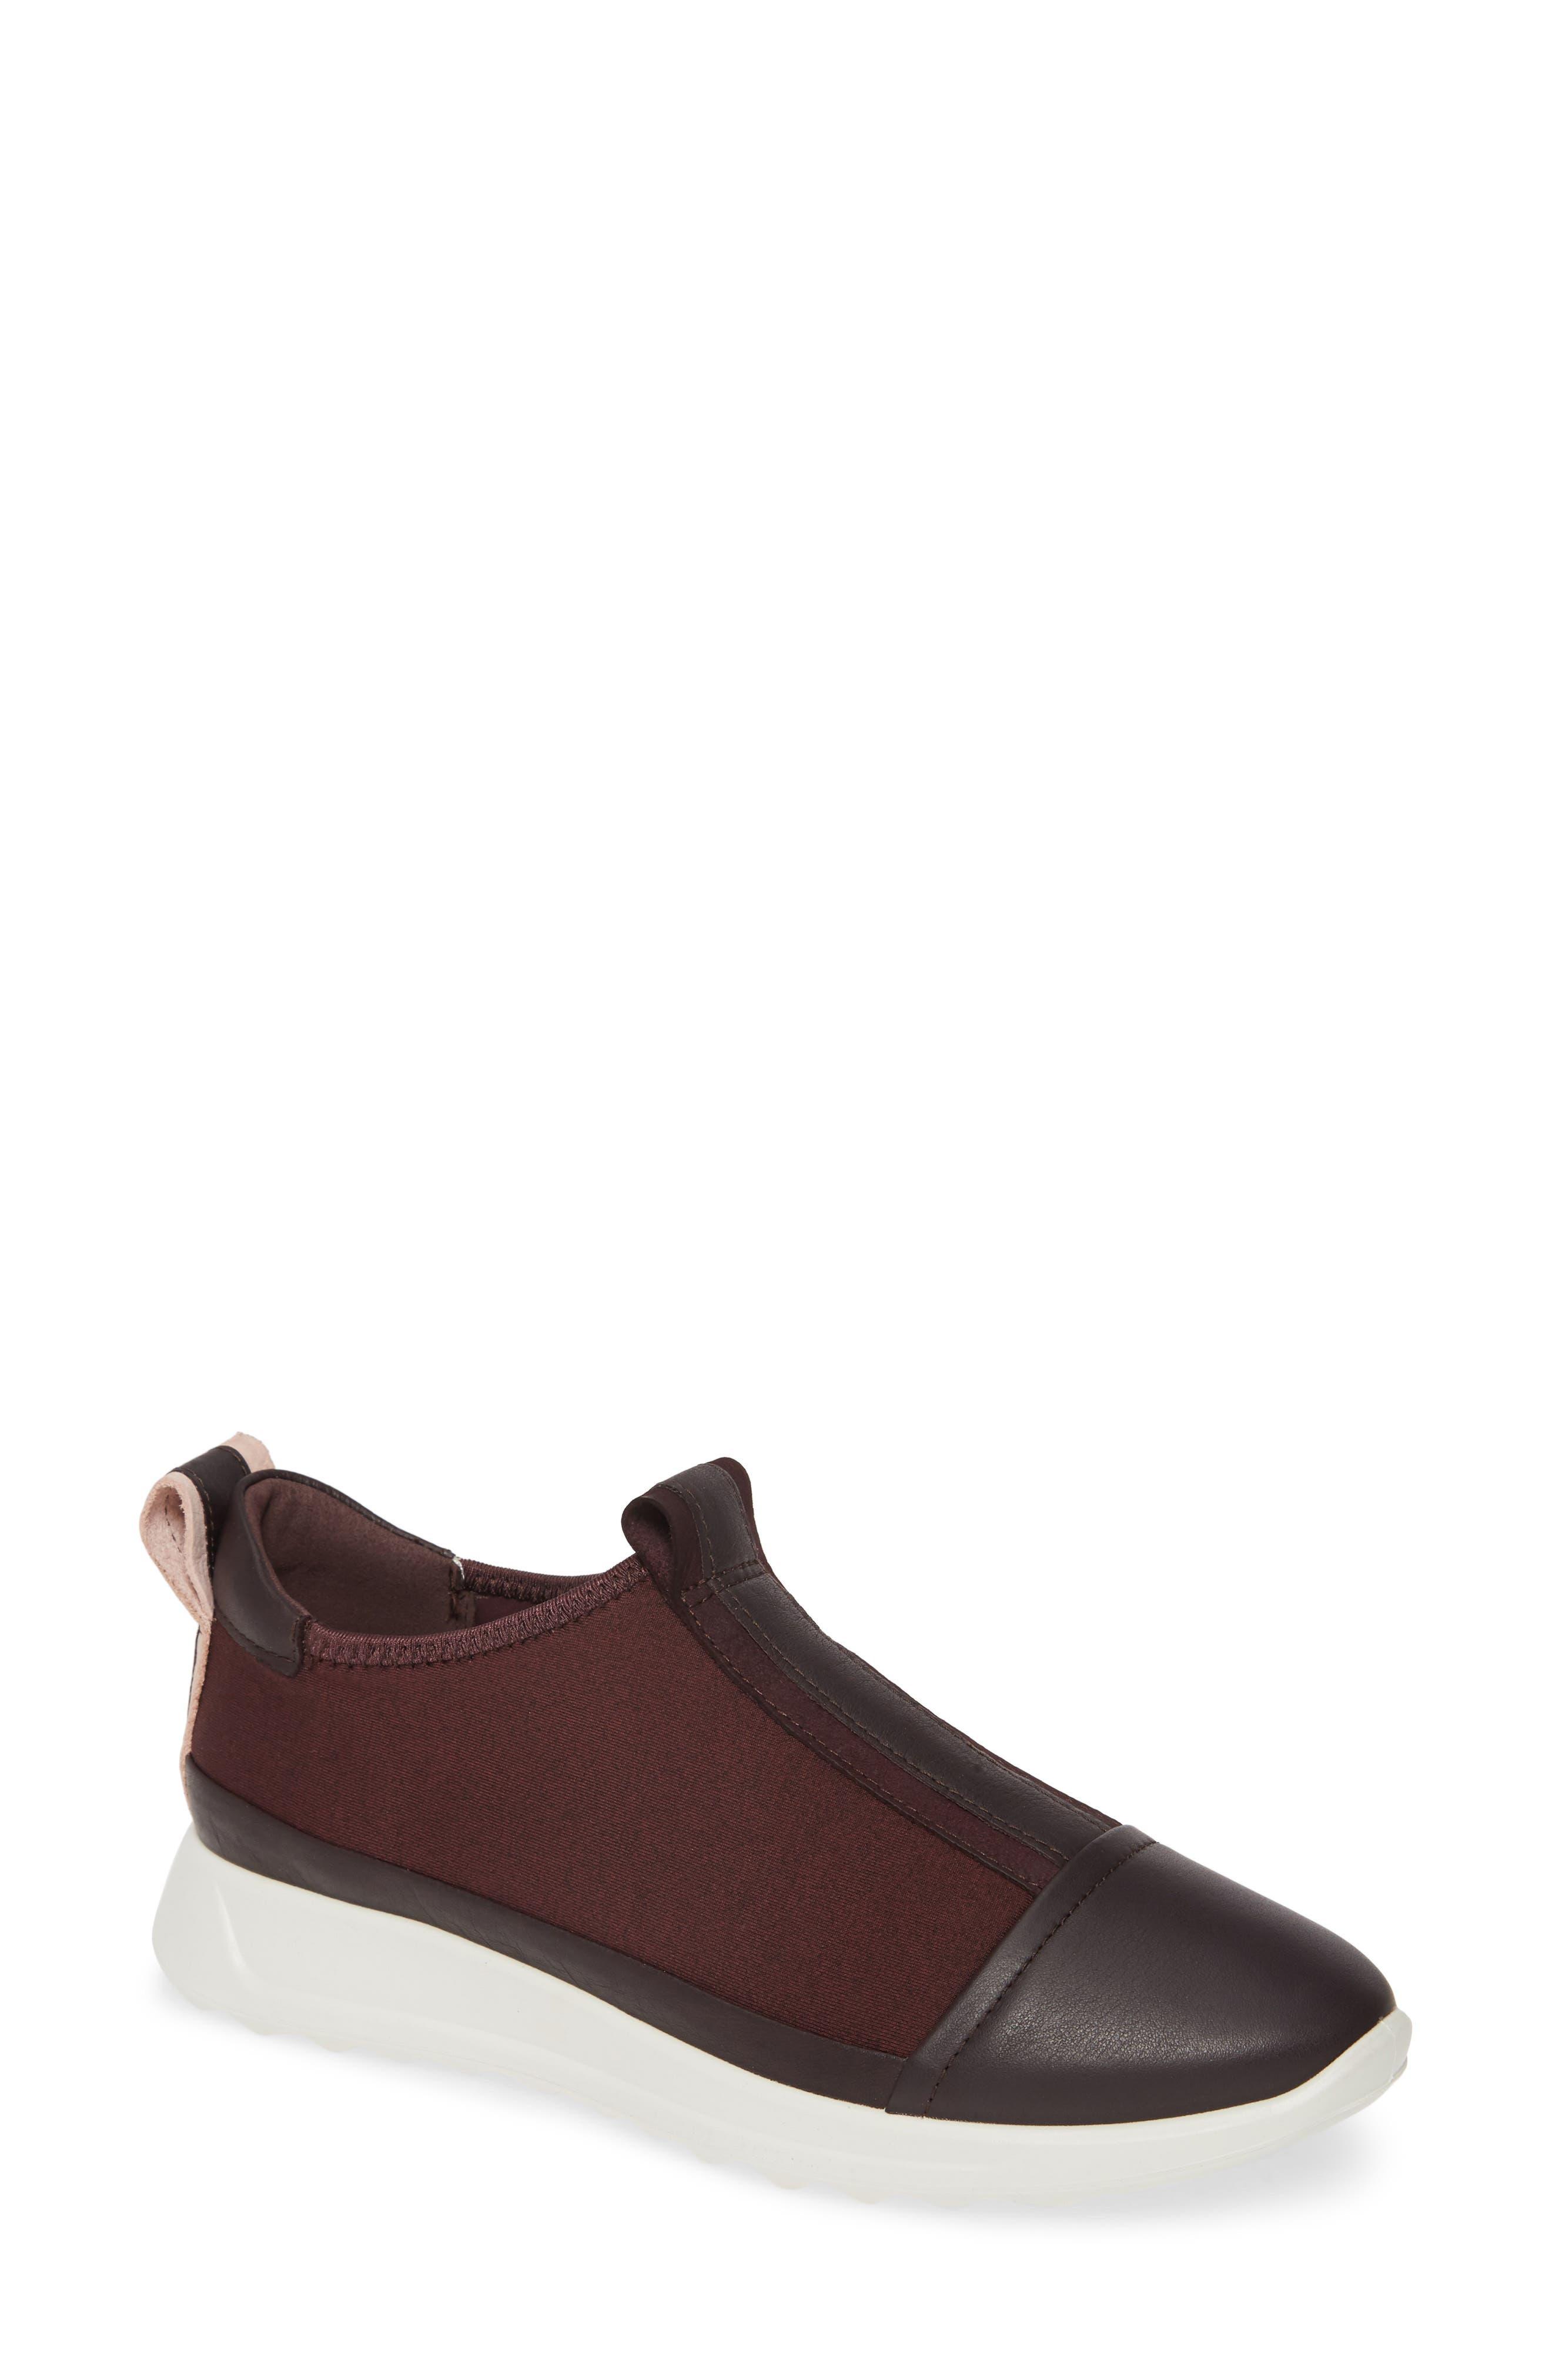 Ecco Flexure Running Shoe, Burgundy